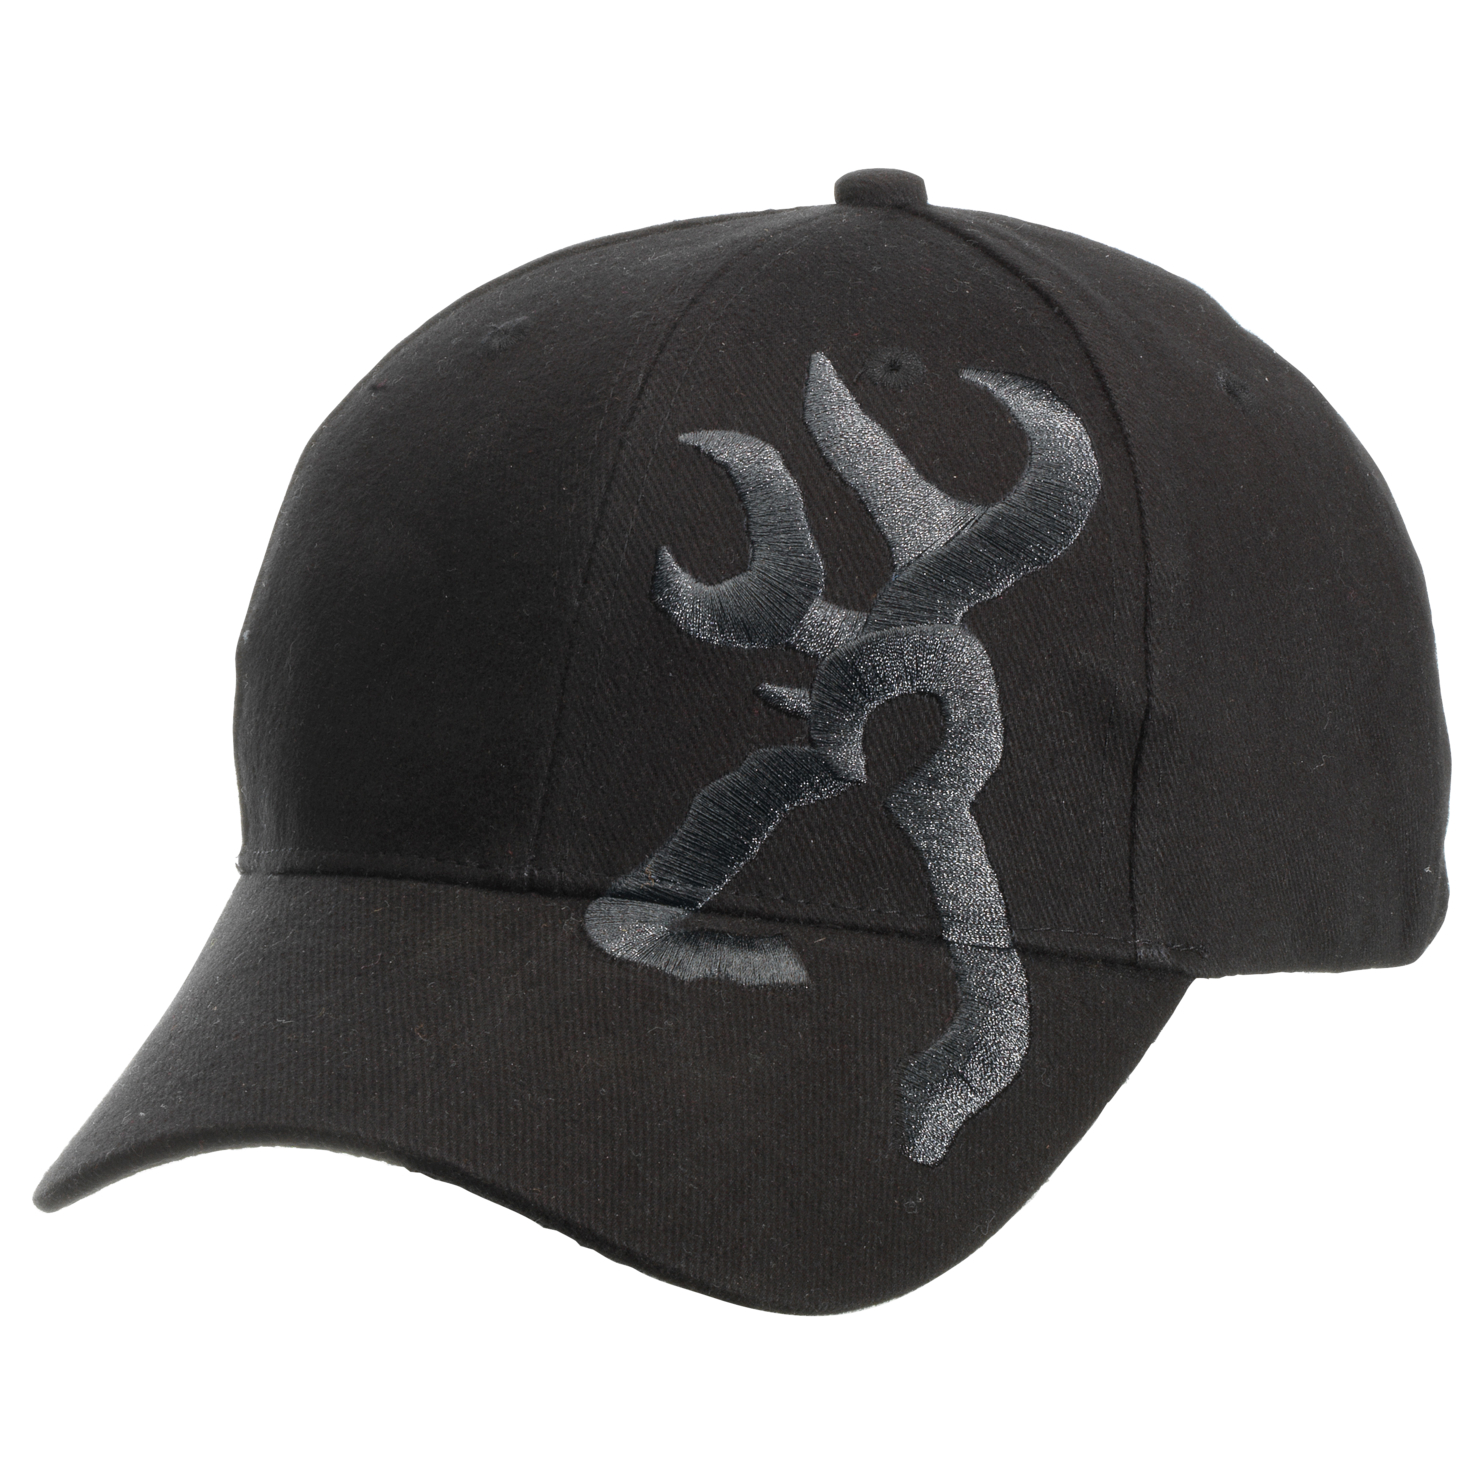 Browning Black Buck Baseball Cap